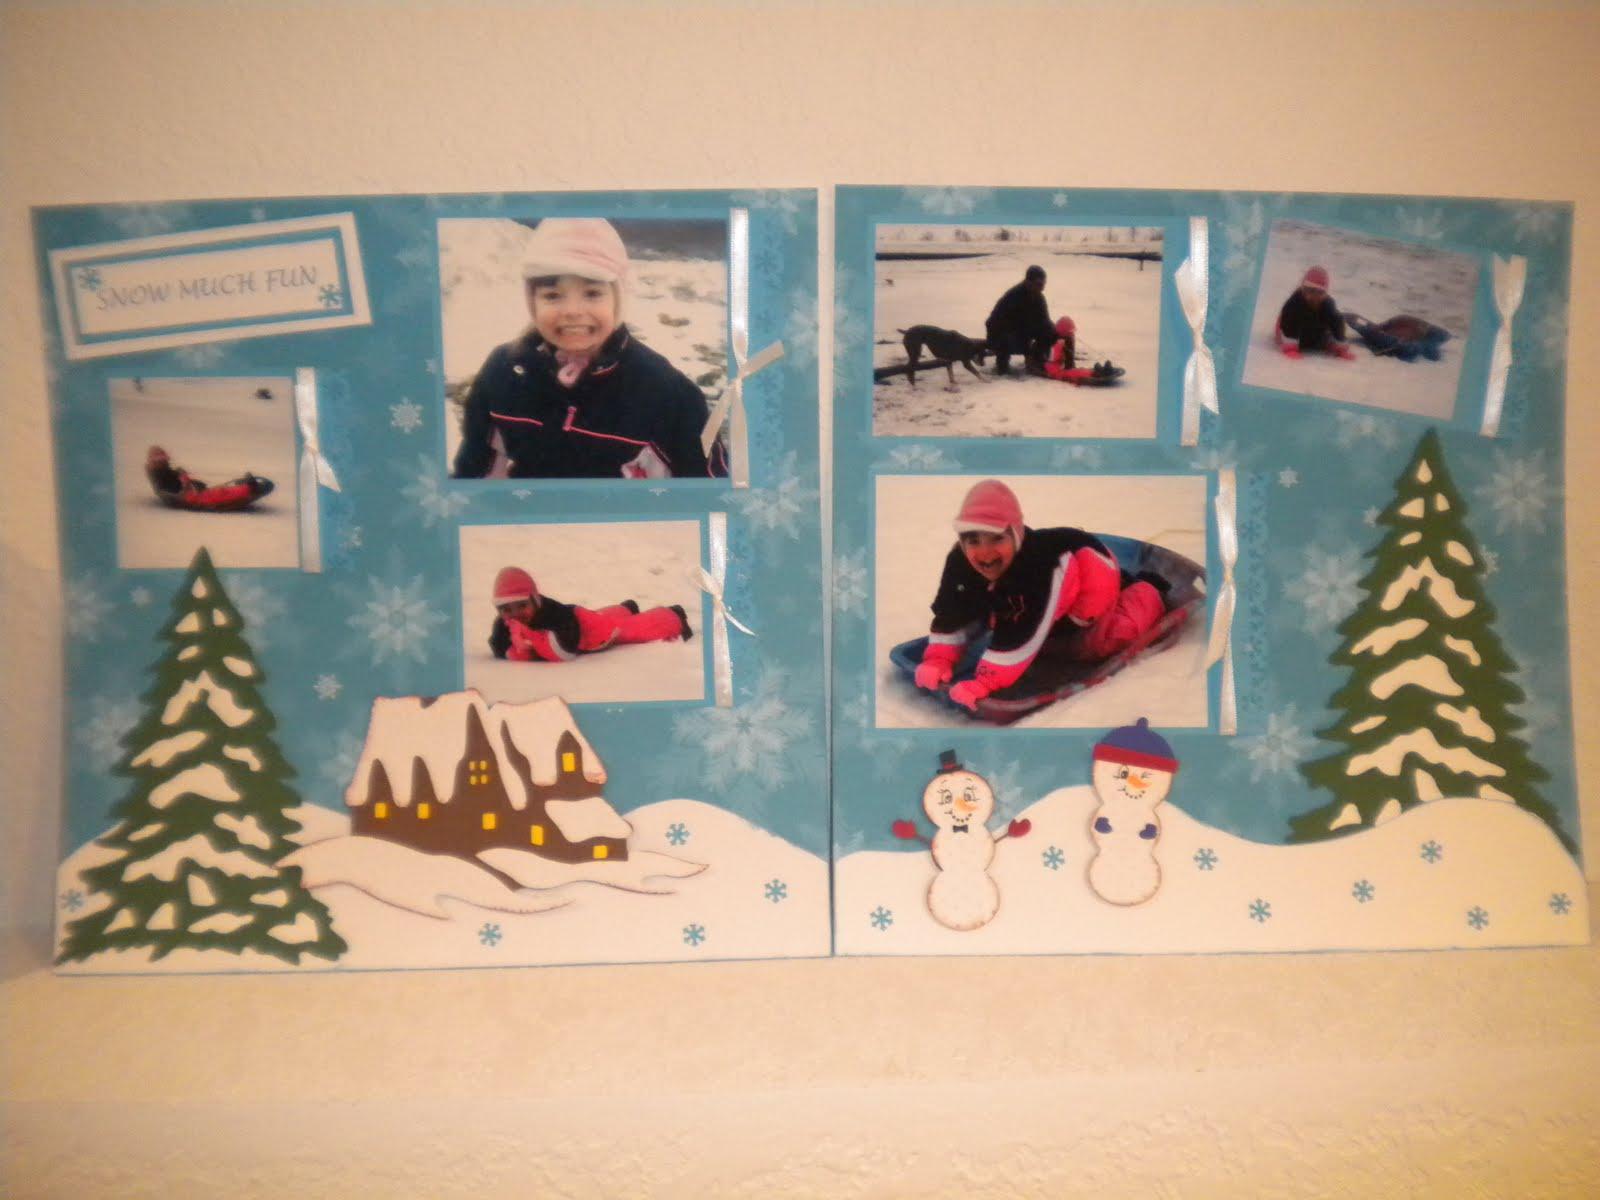 January scrapbook ideas - Winter Snow Much Fun Scrapbook Layout